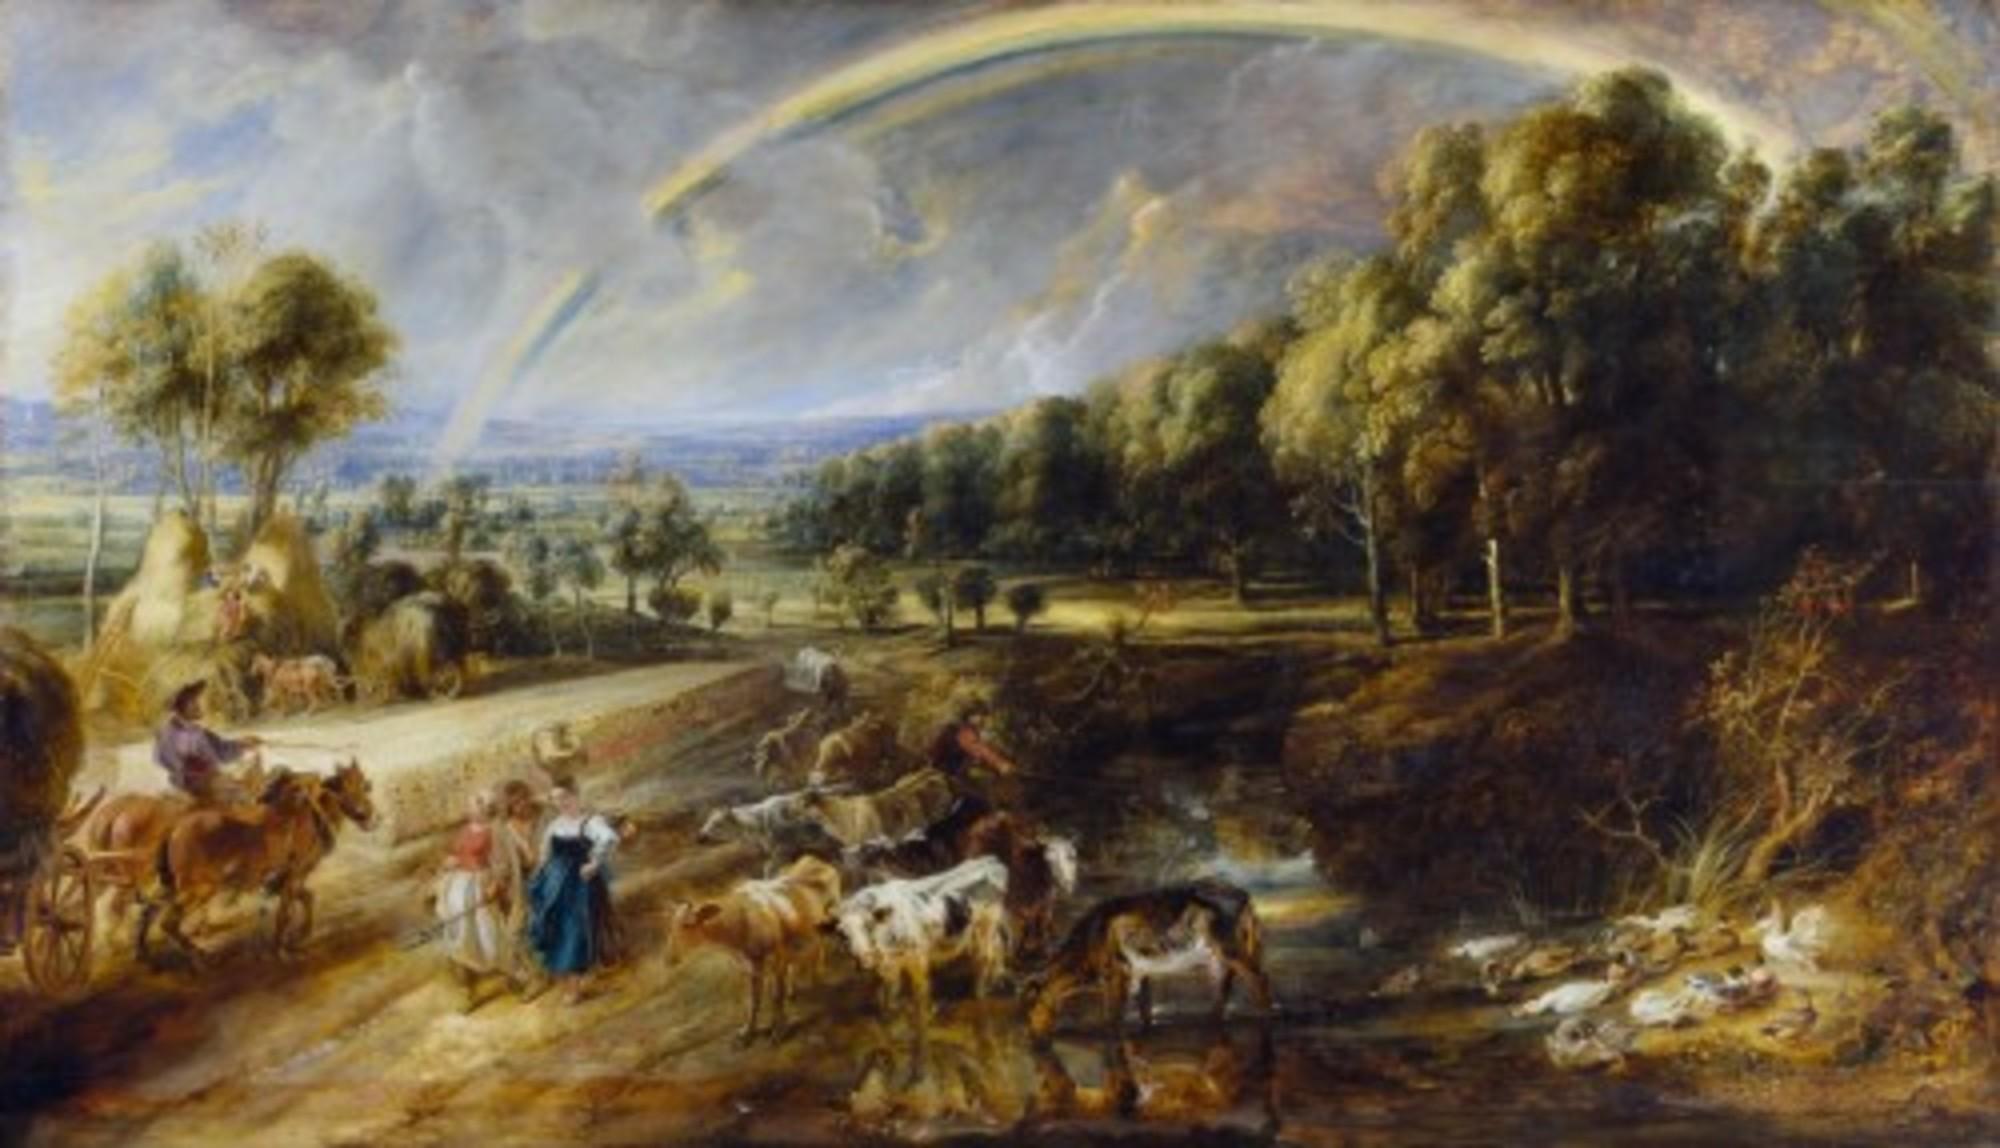 Peter-Paul-Rubens---Landscape-with-a-Rainbow---WGA20411.jpg